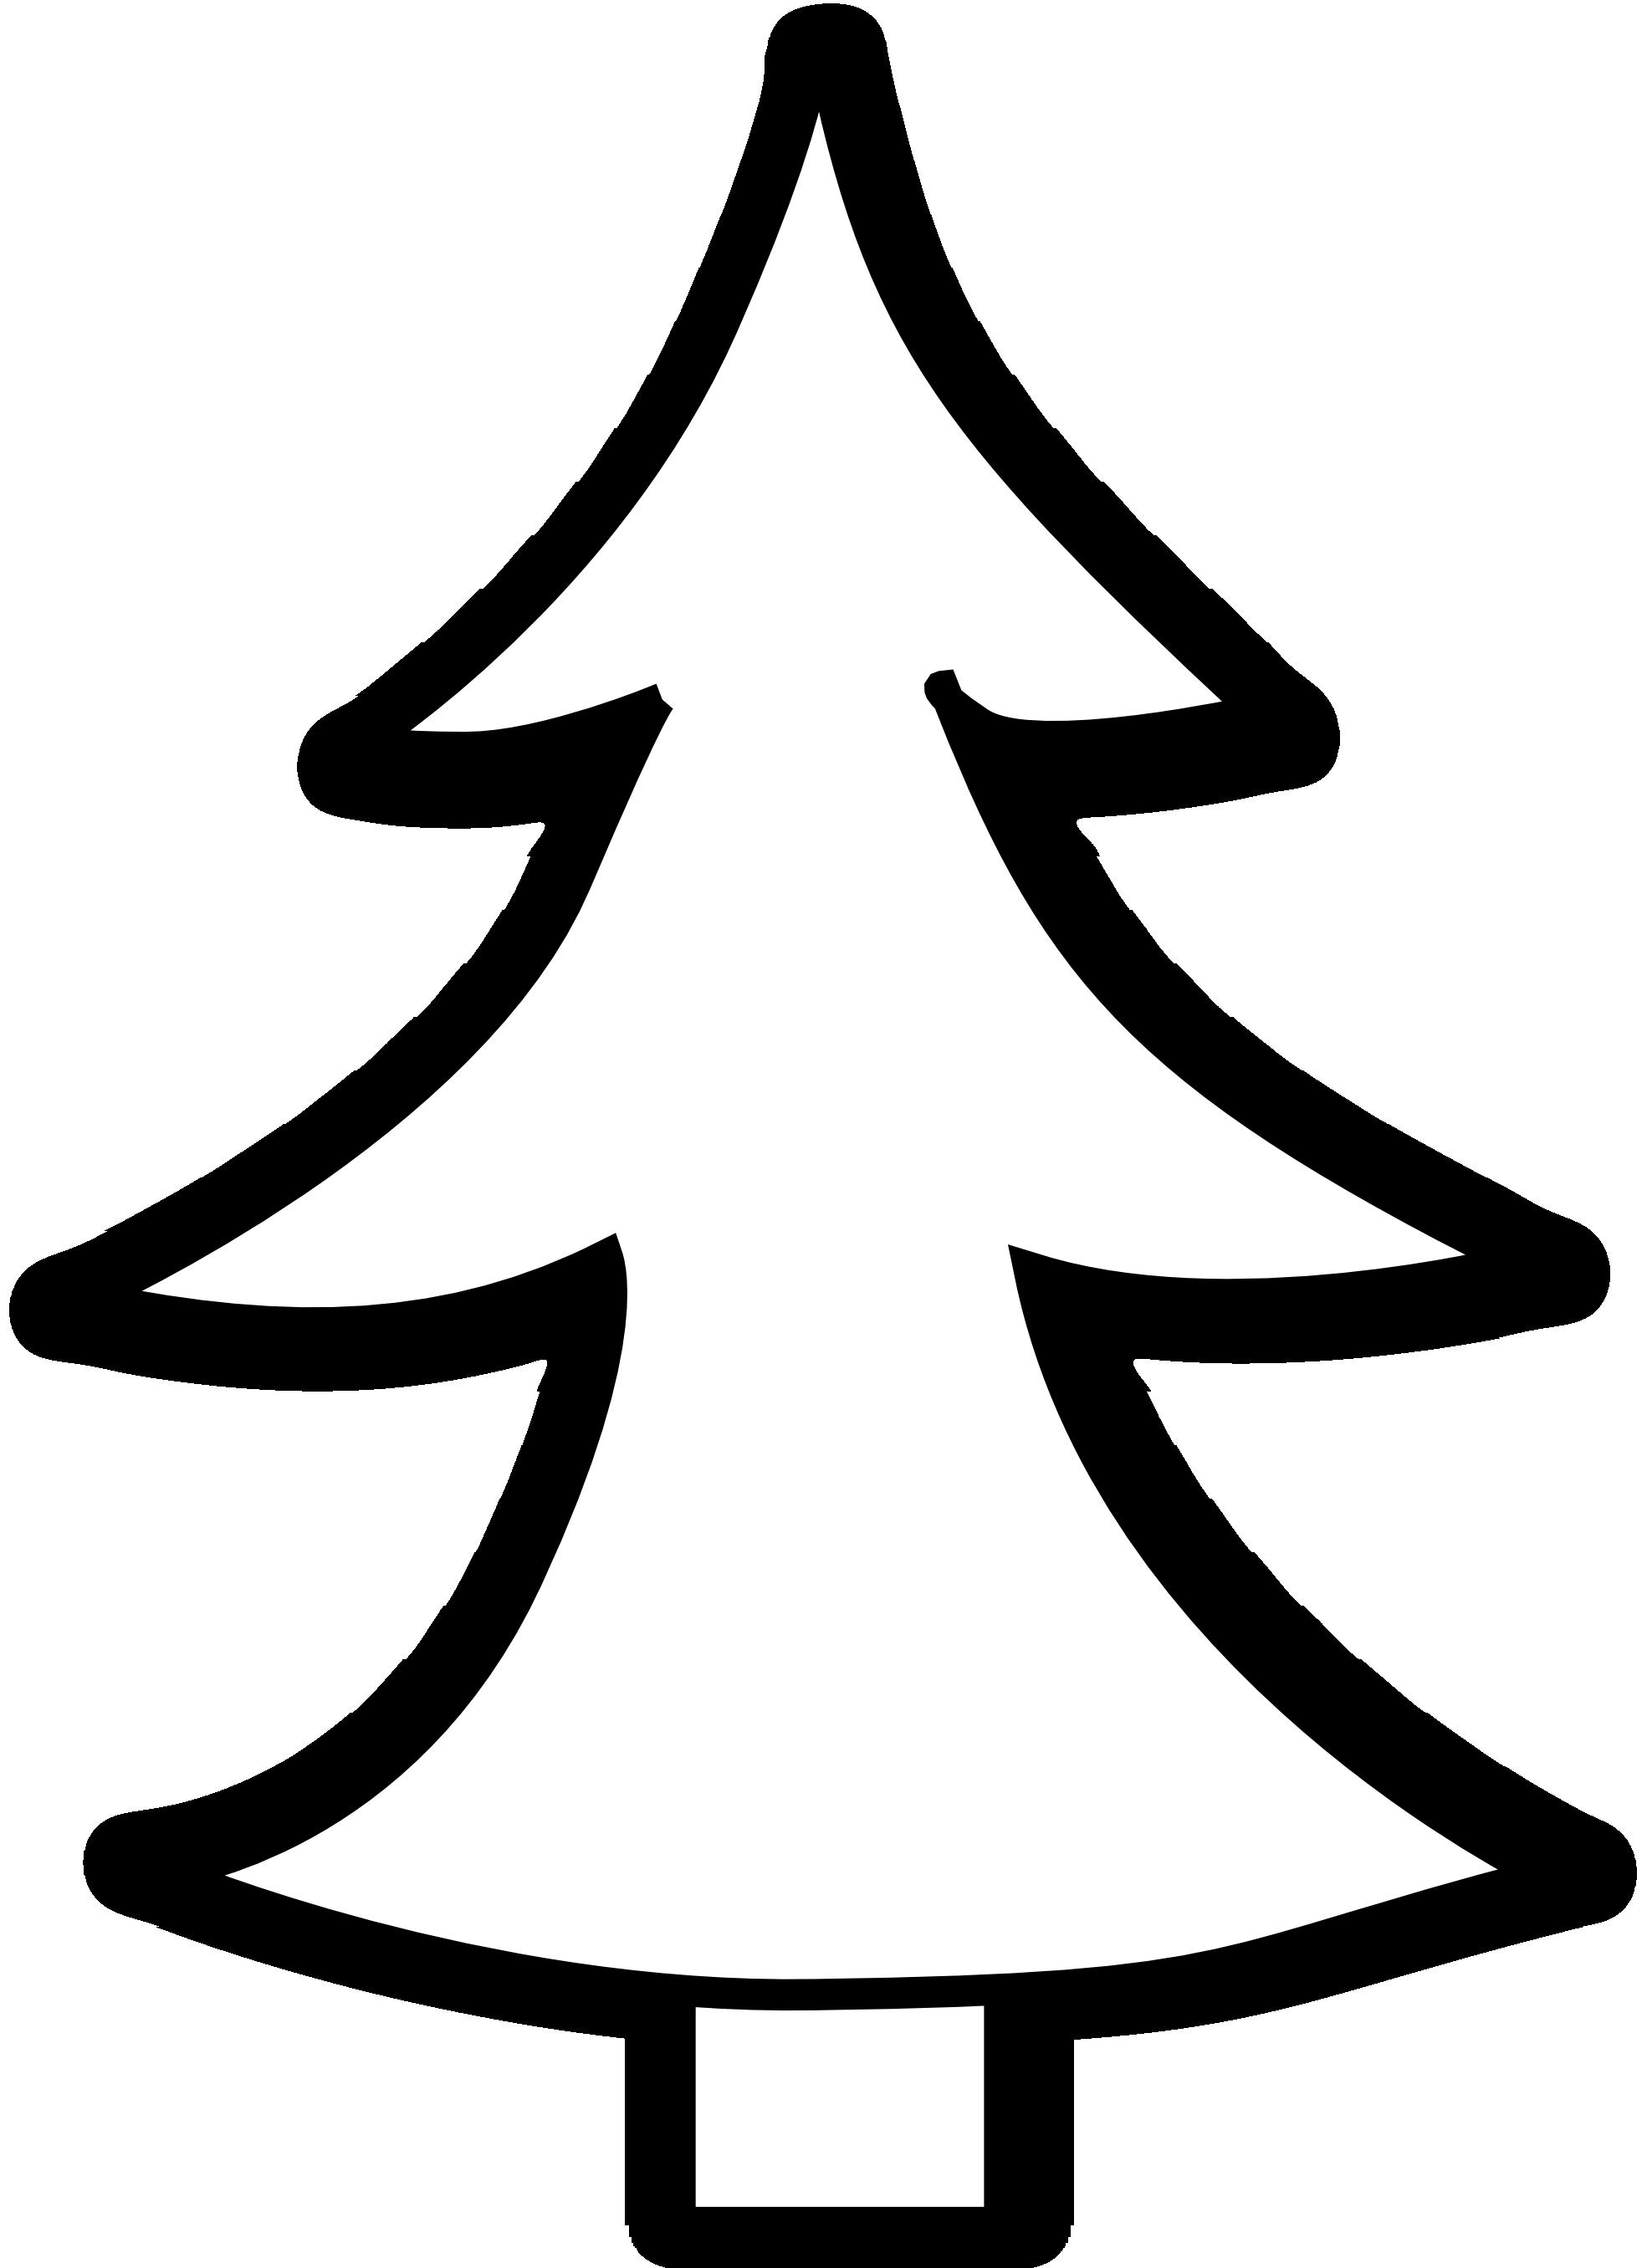 Pine tree clipart black.